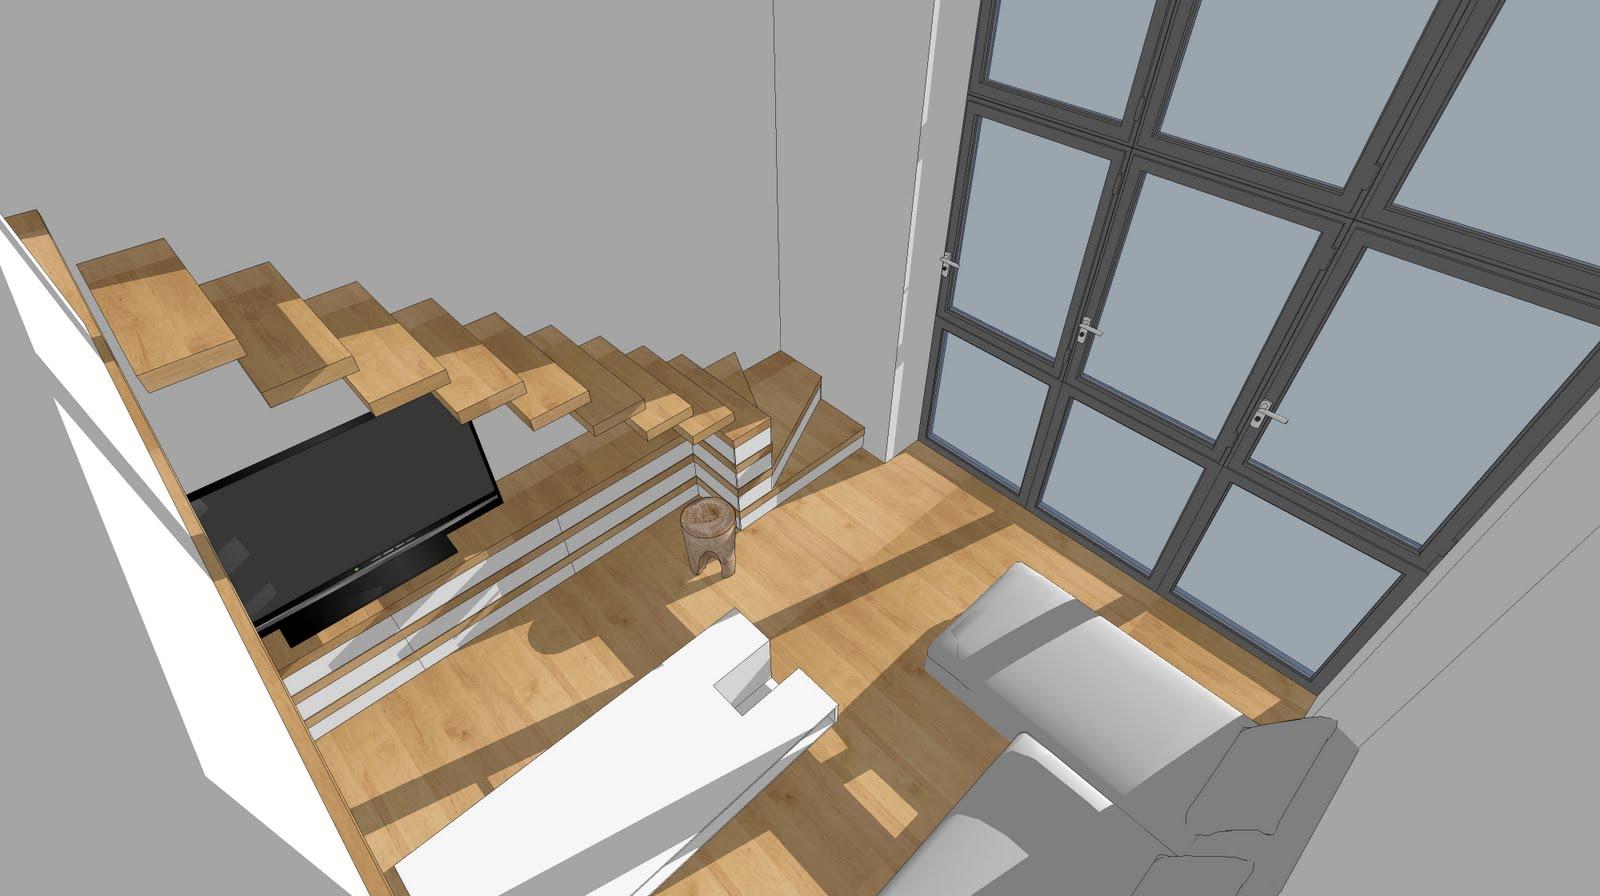 nicolas lozano architecte d 39 int rieur pau 64 mars 2011. Black Bedroom Furniture Sets. Home Design Ideas